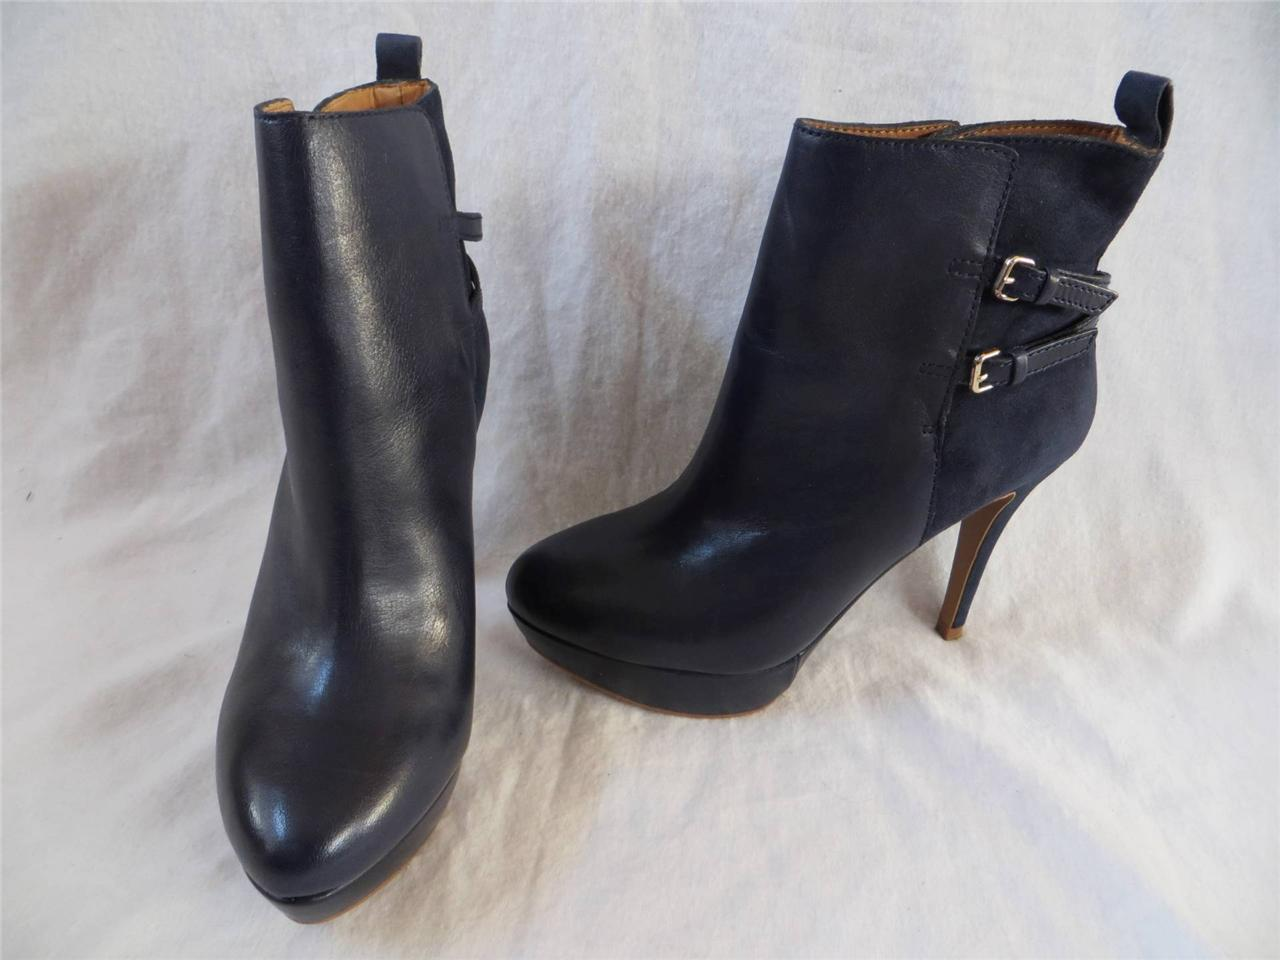 zara navy blue suede leather buckle high heel platform